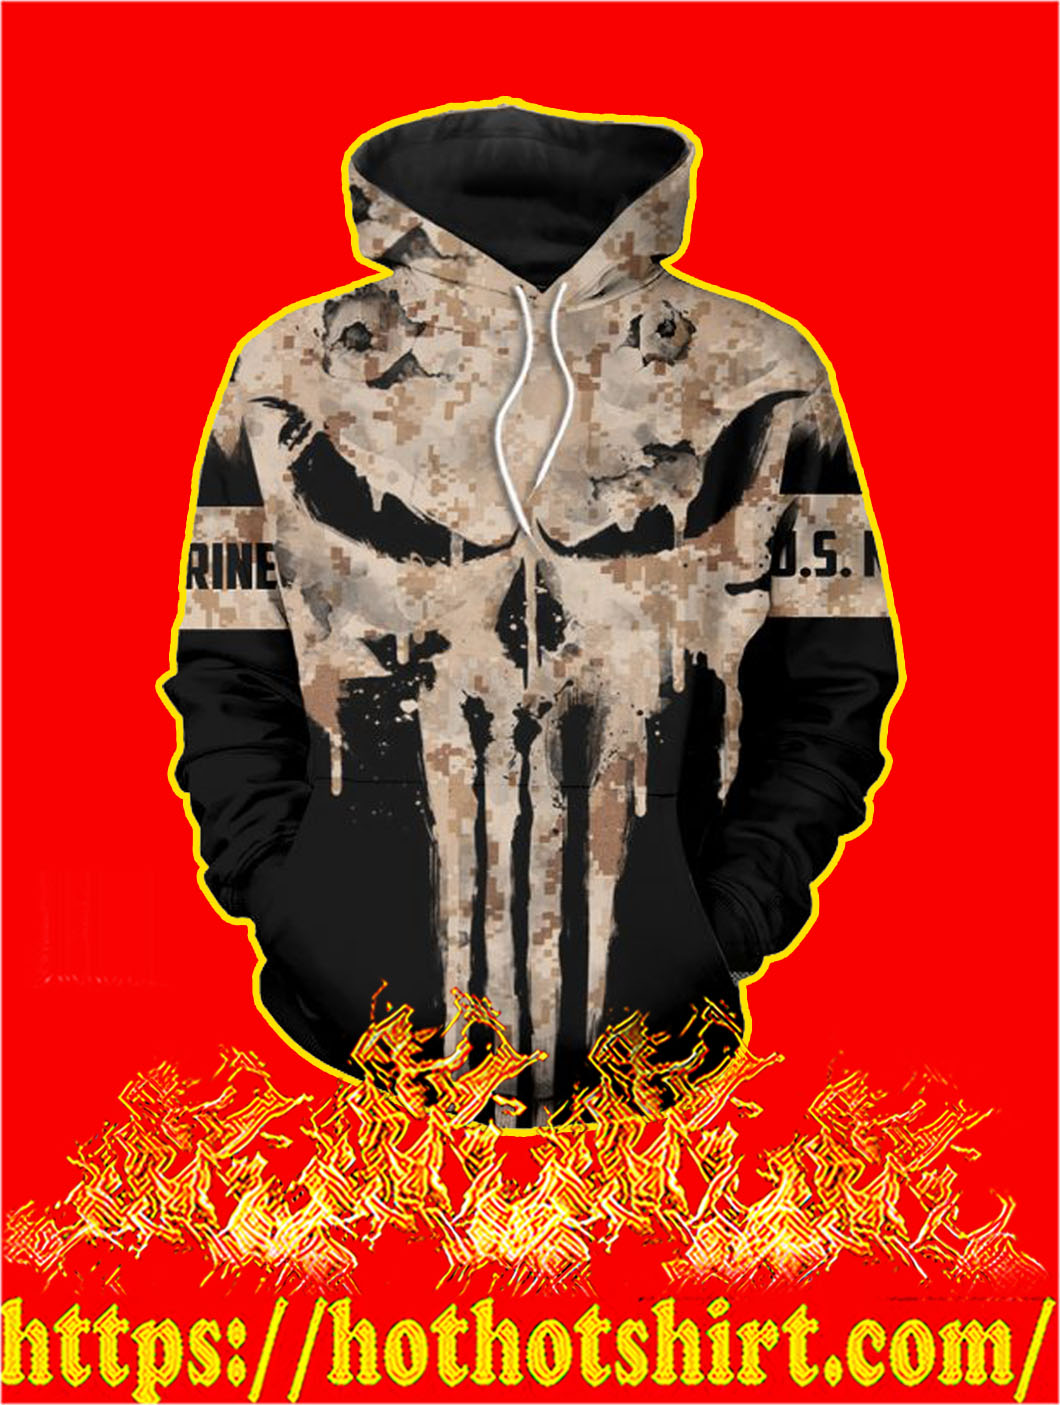 U.S Marine Punisher Skull 3D Printed Hoodie